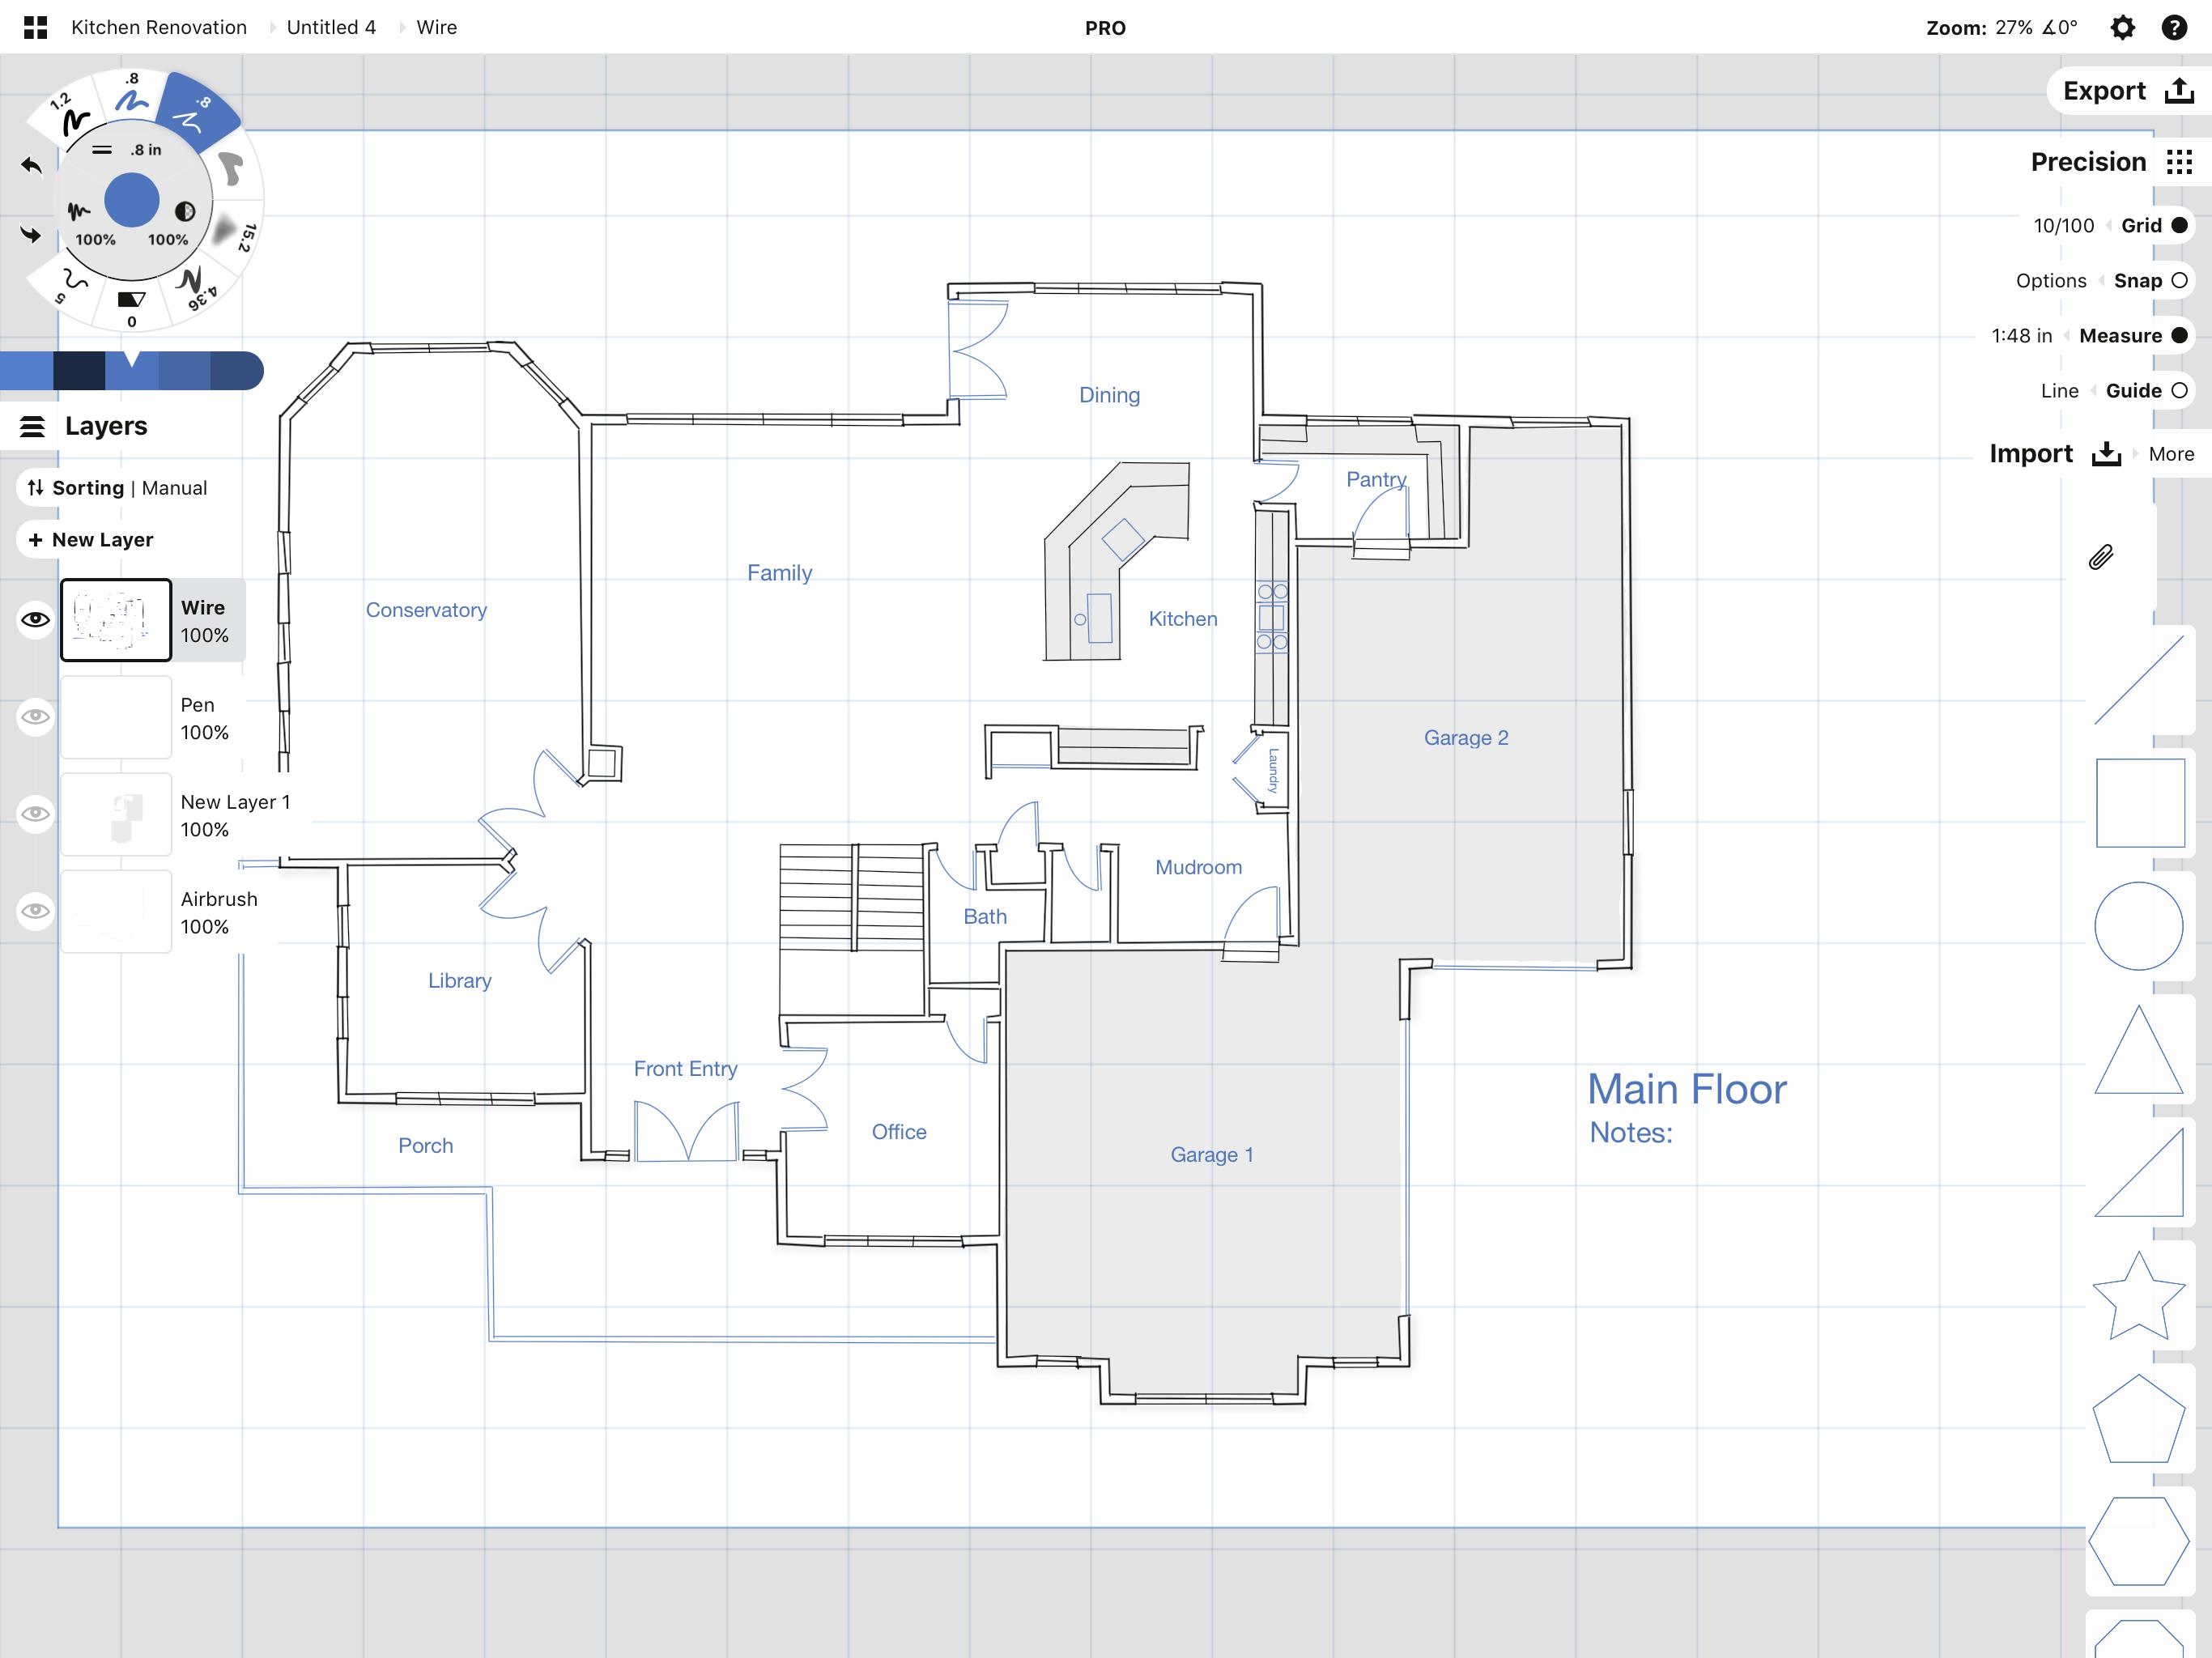 templates_designplanexample.PNG